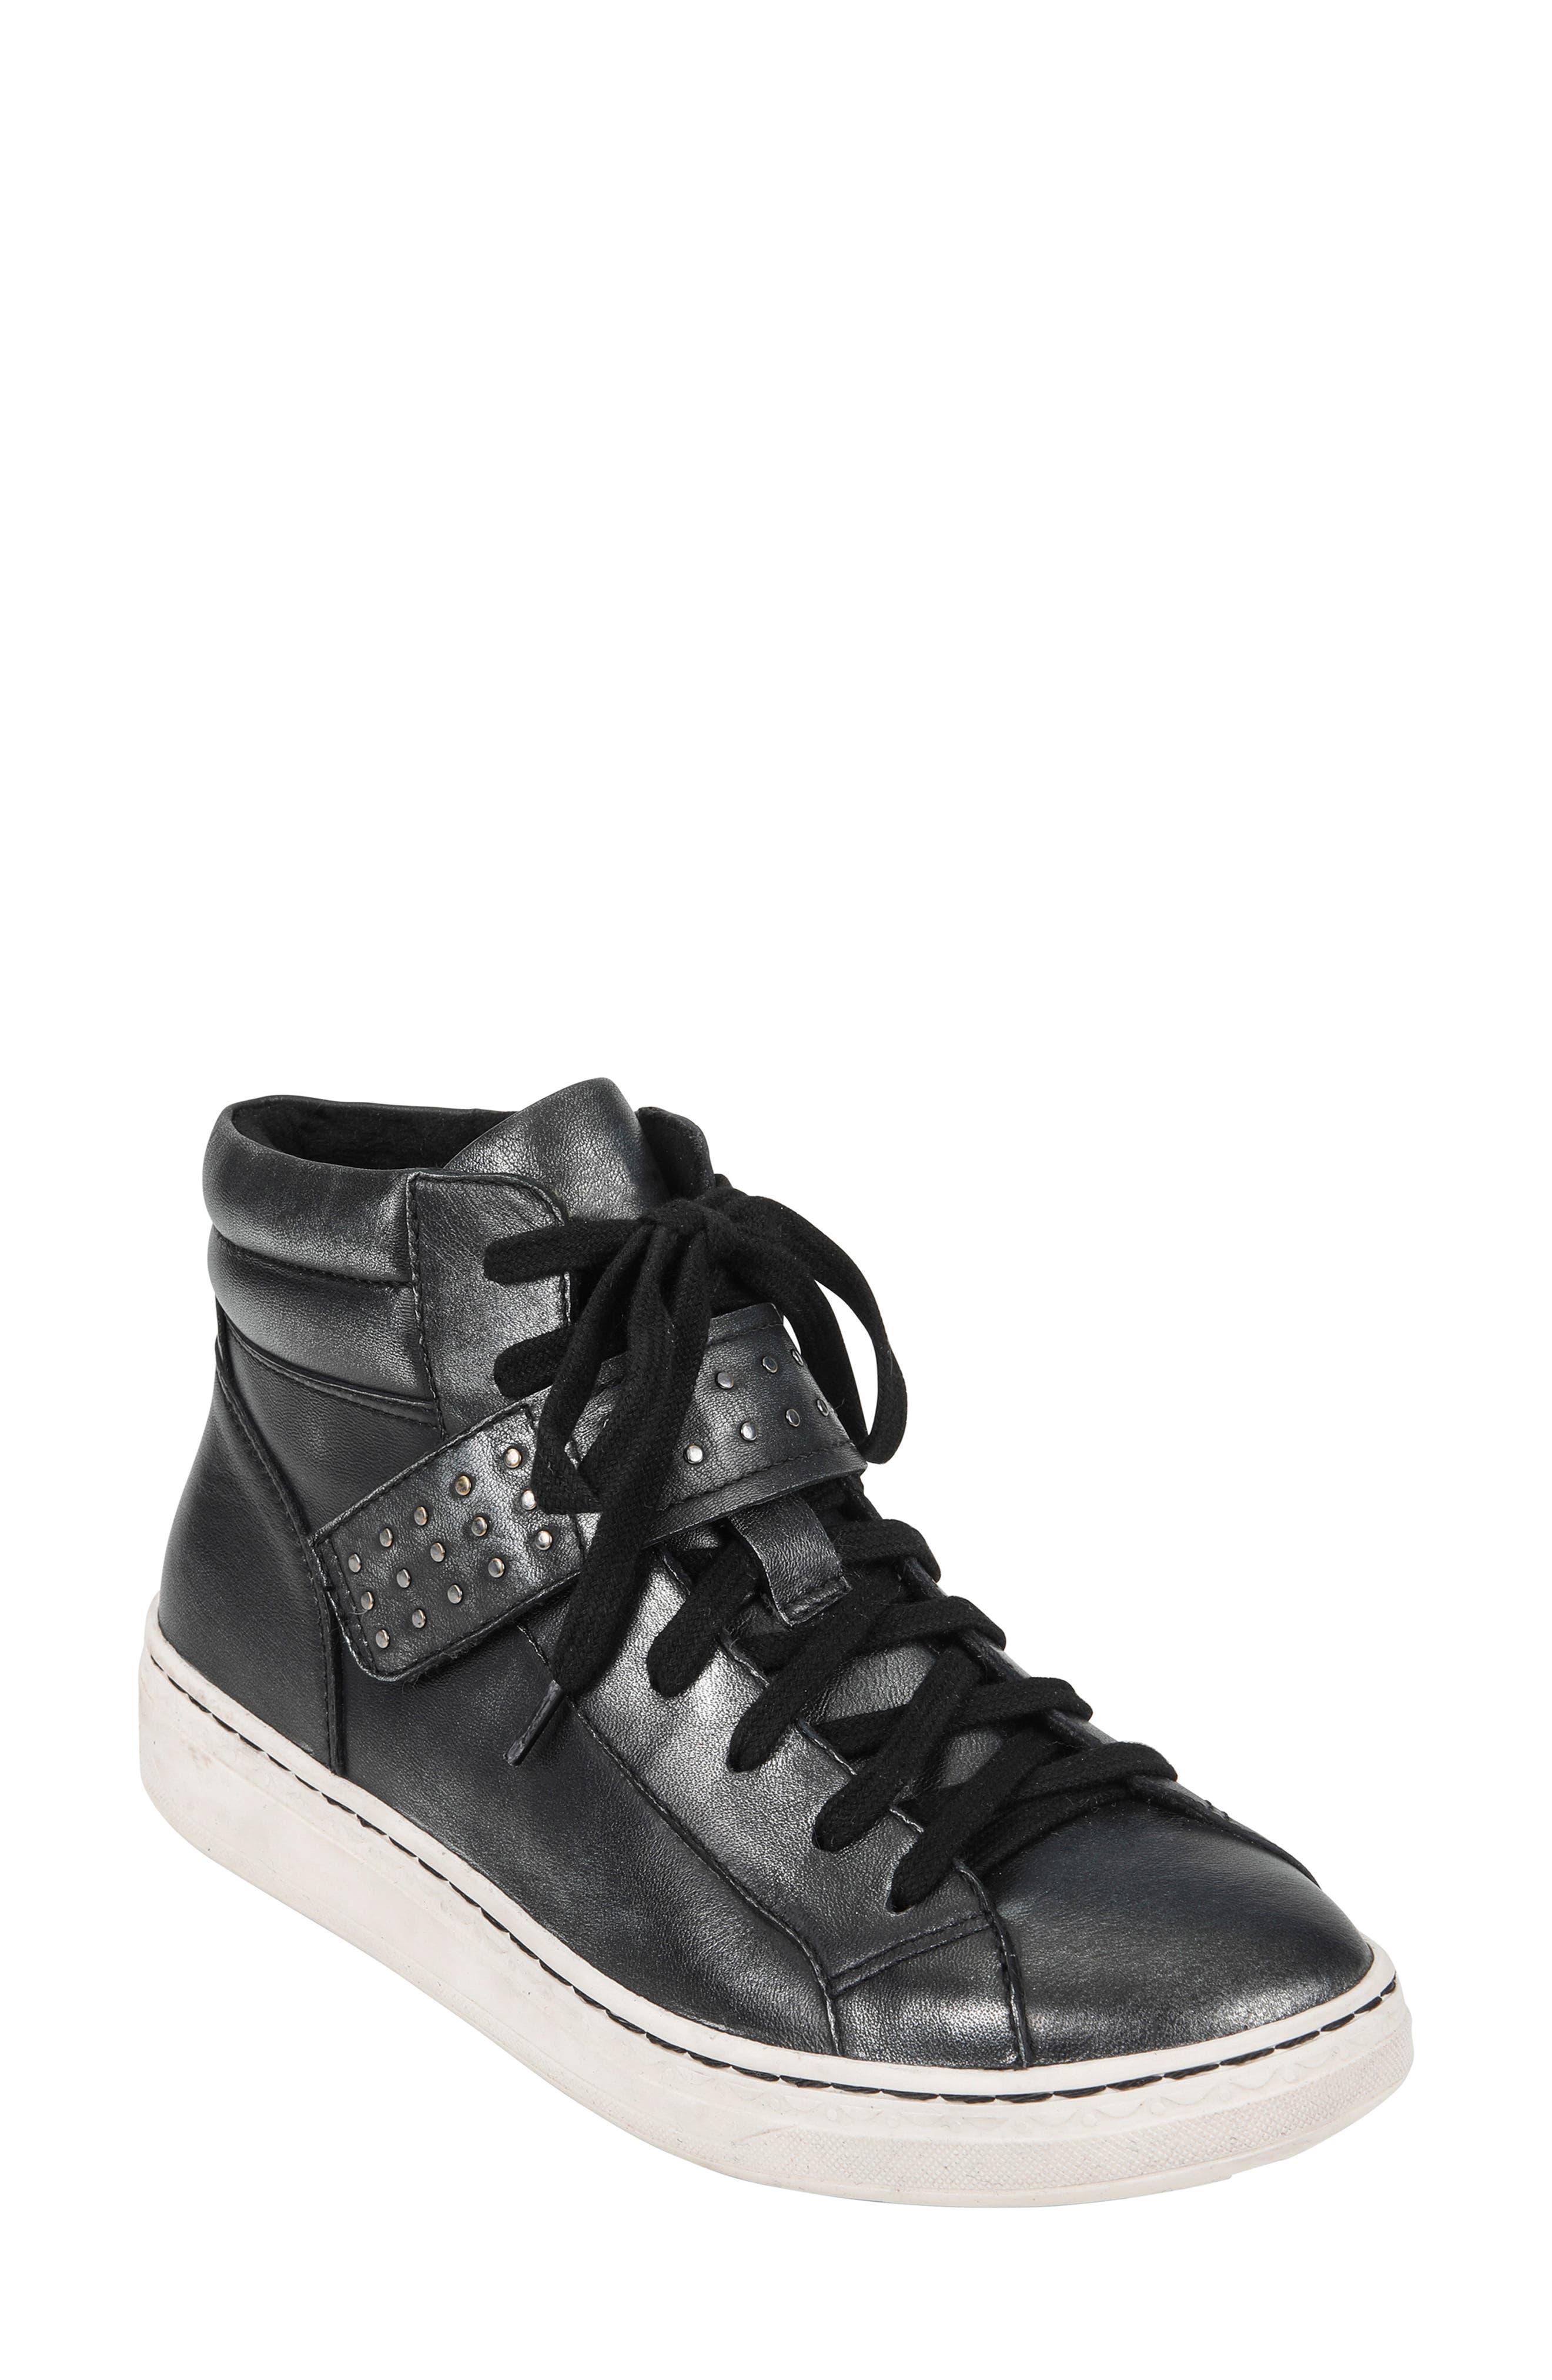 Zeal High Top Sneaker,                             Main thumbnail 1, color,                             BLACK METALLIC LEATHER